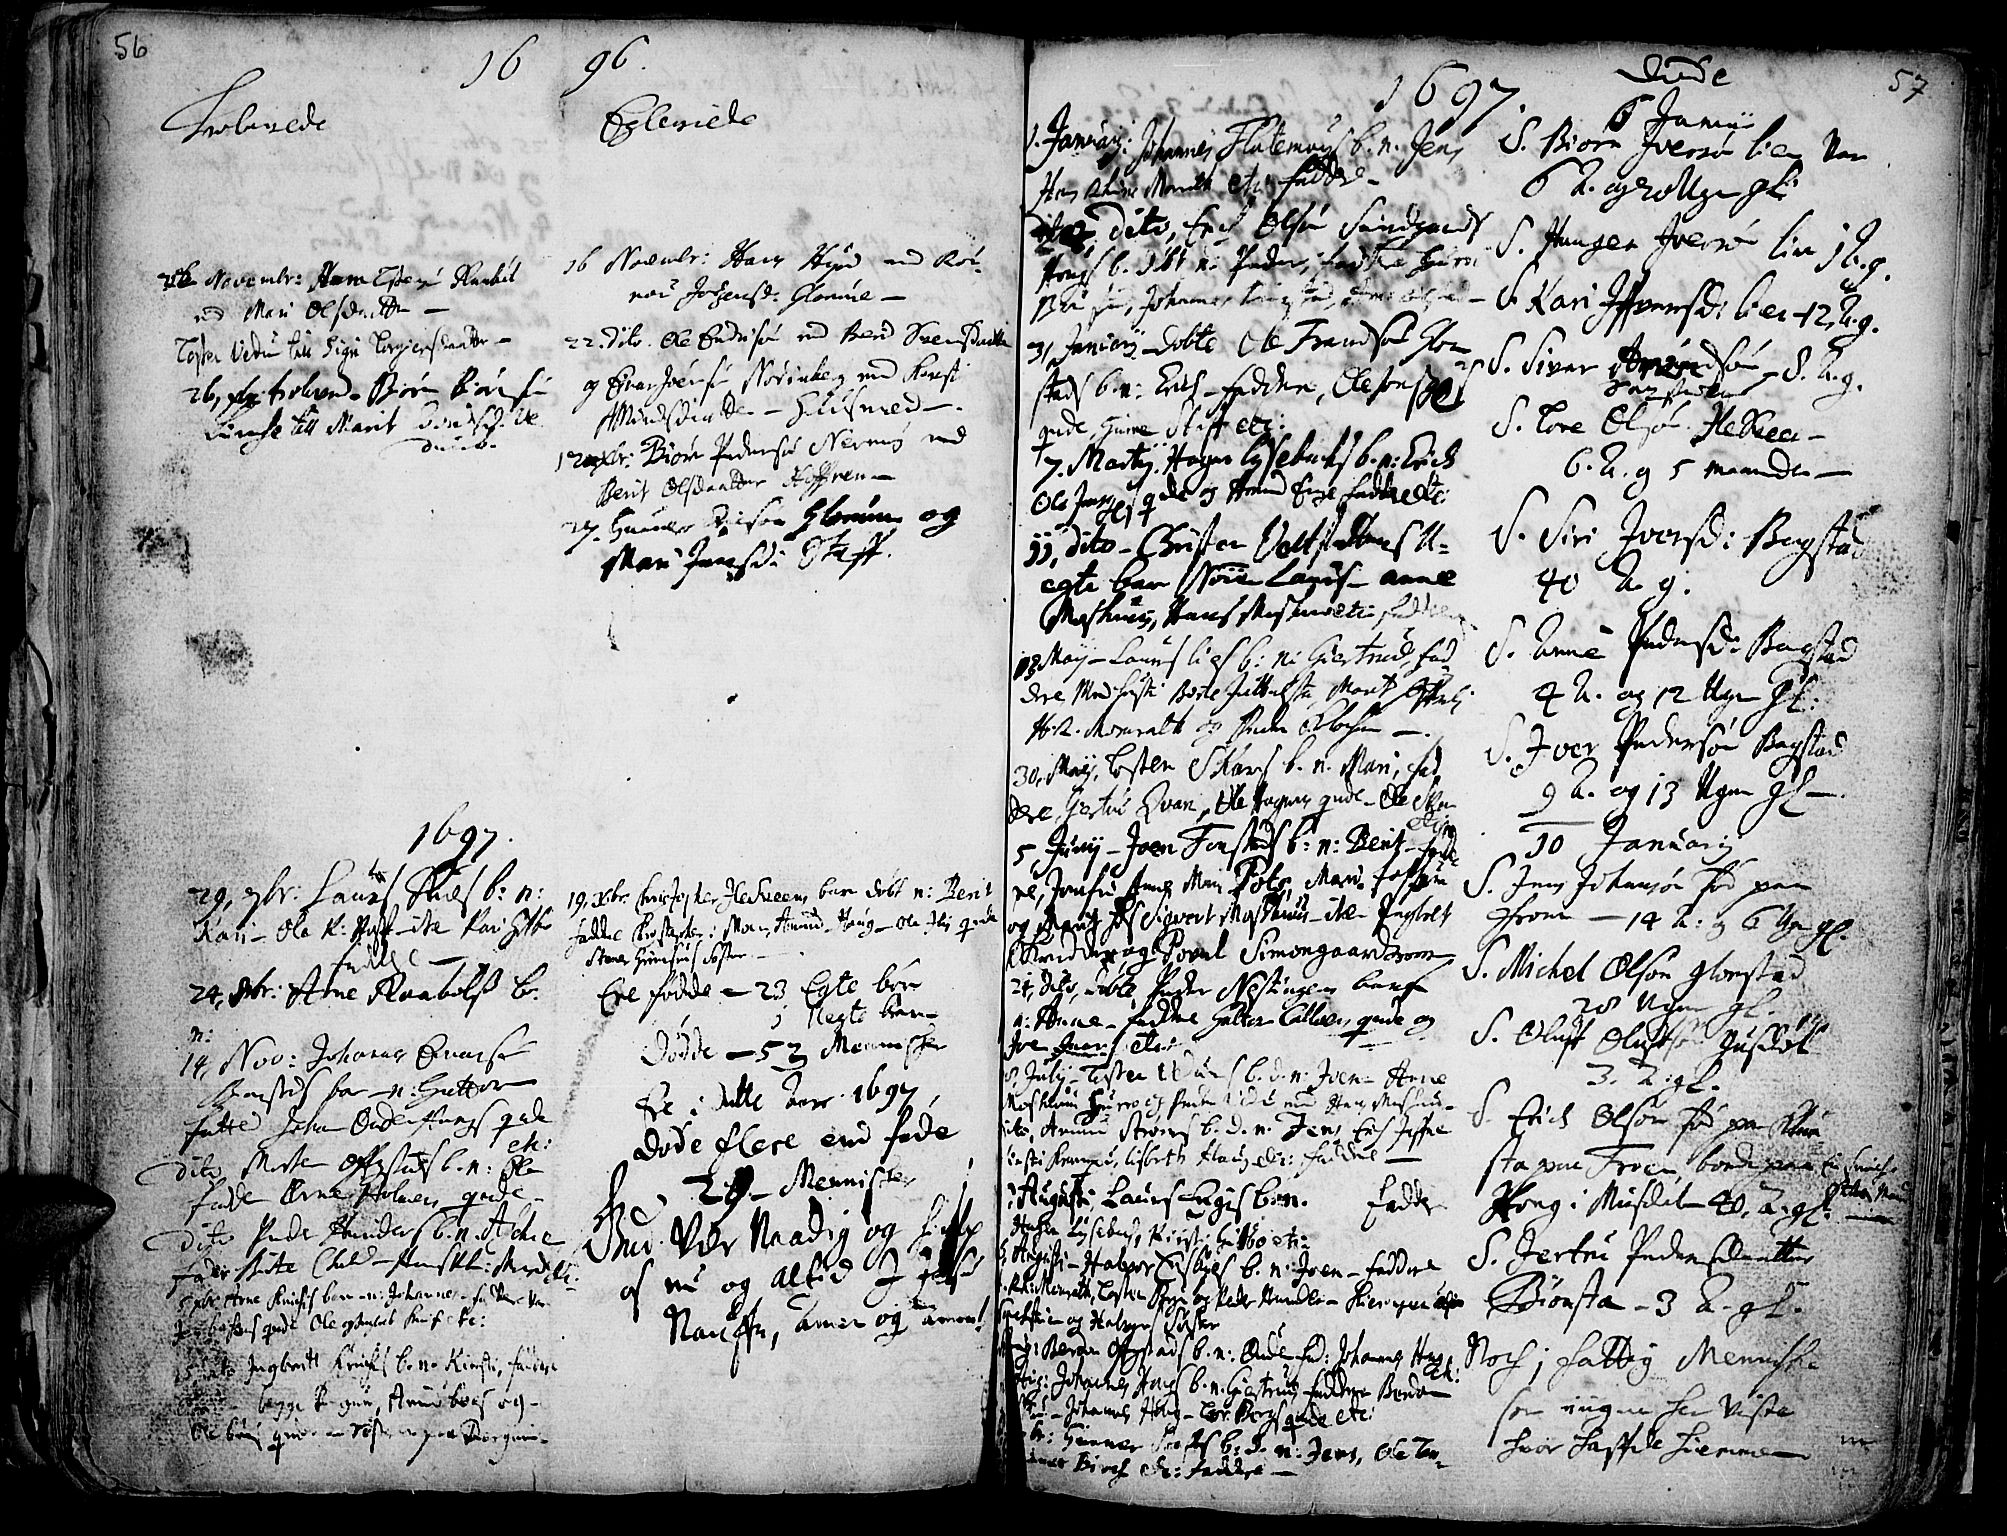 SAH, Øyer prestekontor, Ministerialbok nr. 1, 1671-1727, s. 56-57